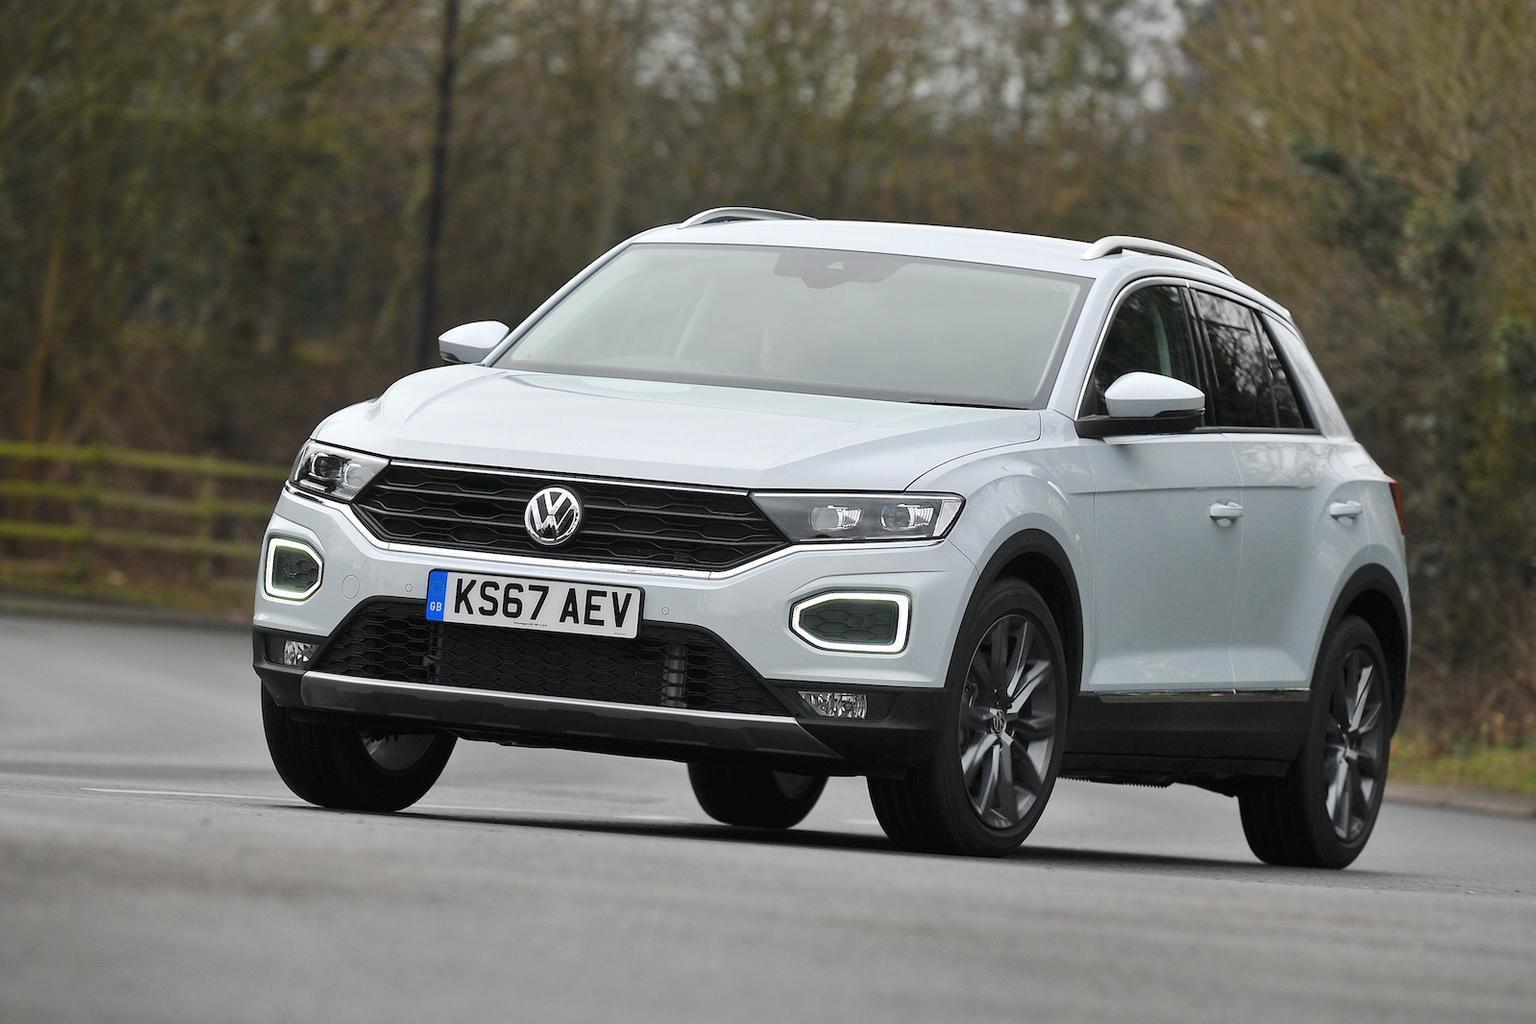 Volkswagen T Roc Tarif : 2018 volkswagen t roc 2 0 tdi 150 4motion review price ~ Pogadajmy.info Styles, Décorations et Voitures